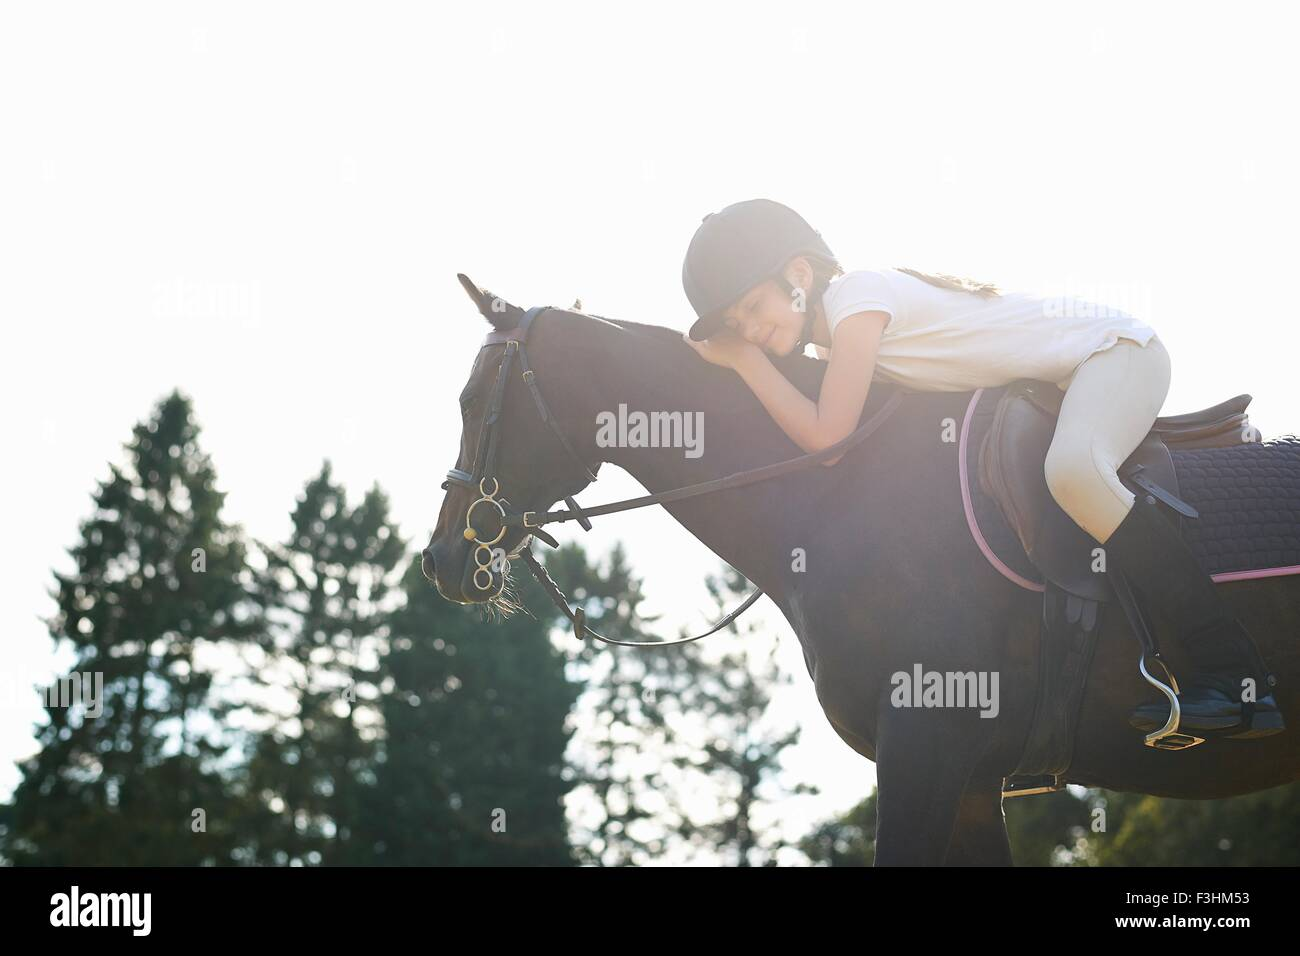 Girl on horseback leaning forward to pet horse - Stock Image